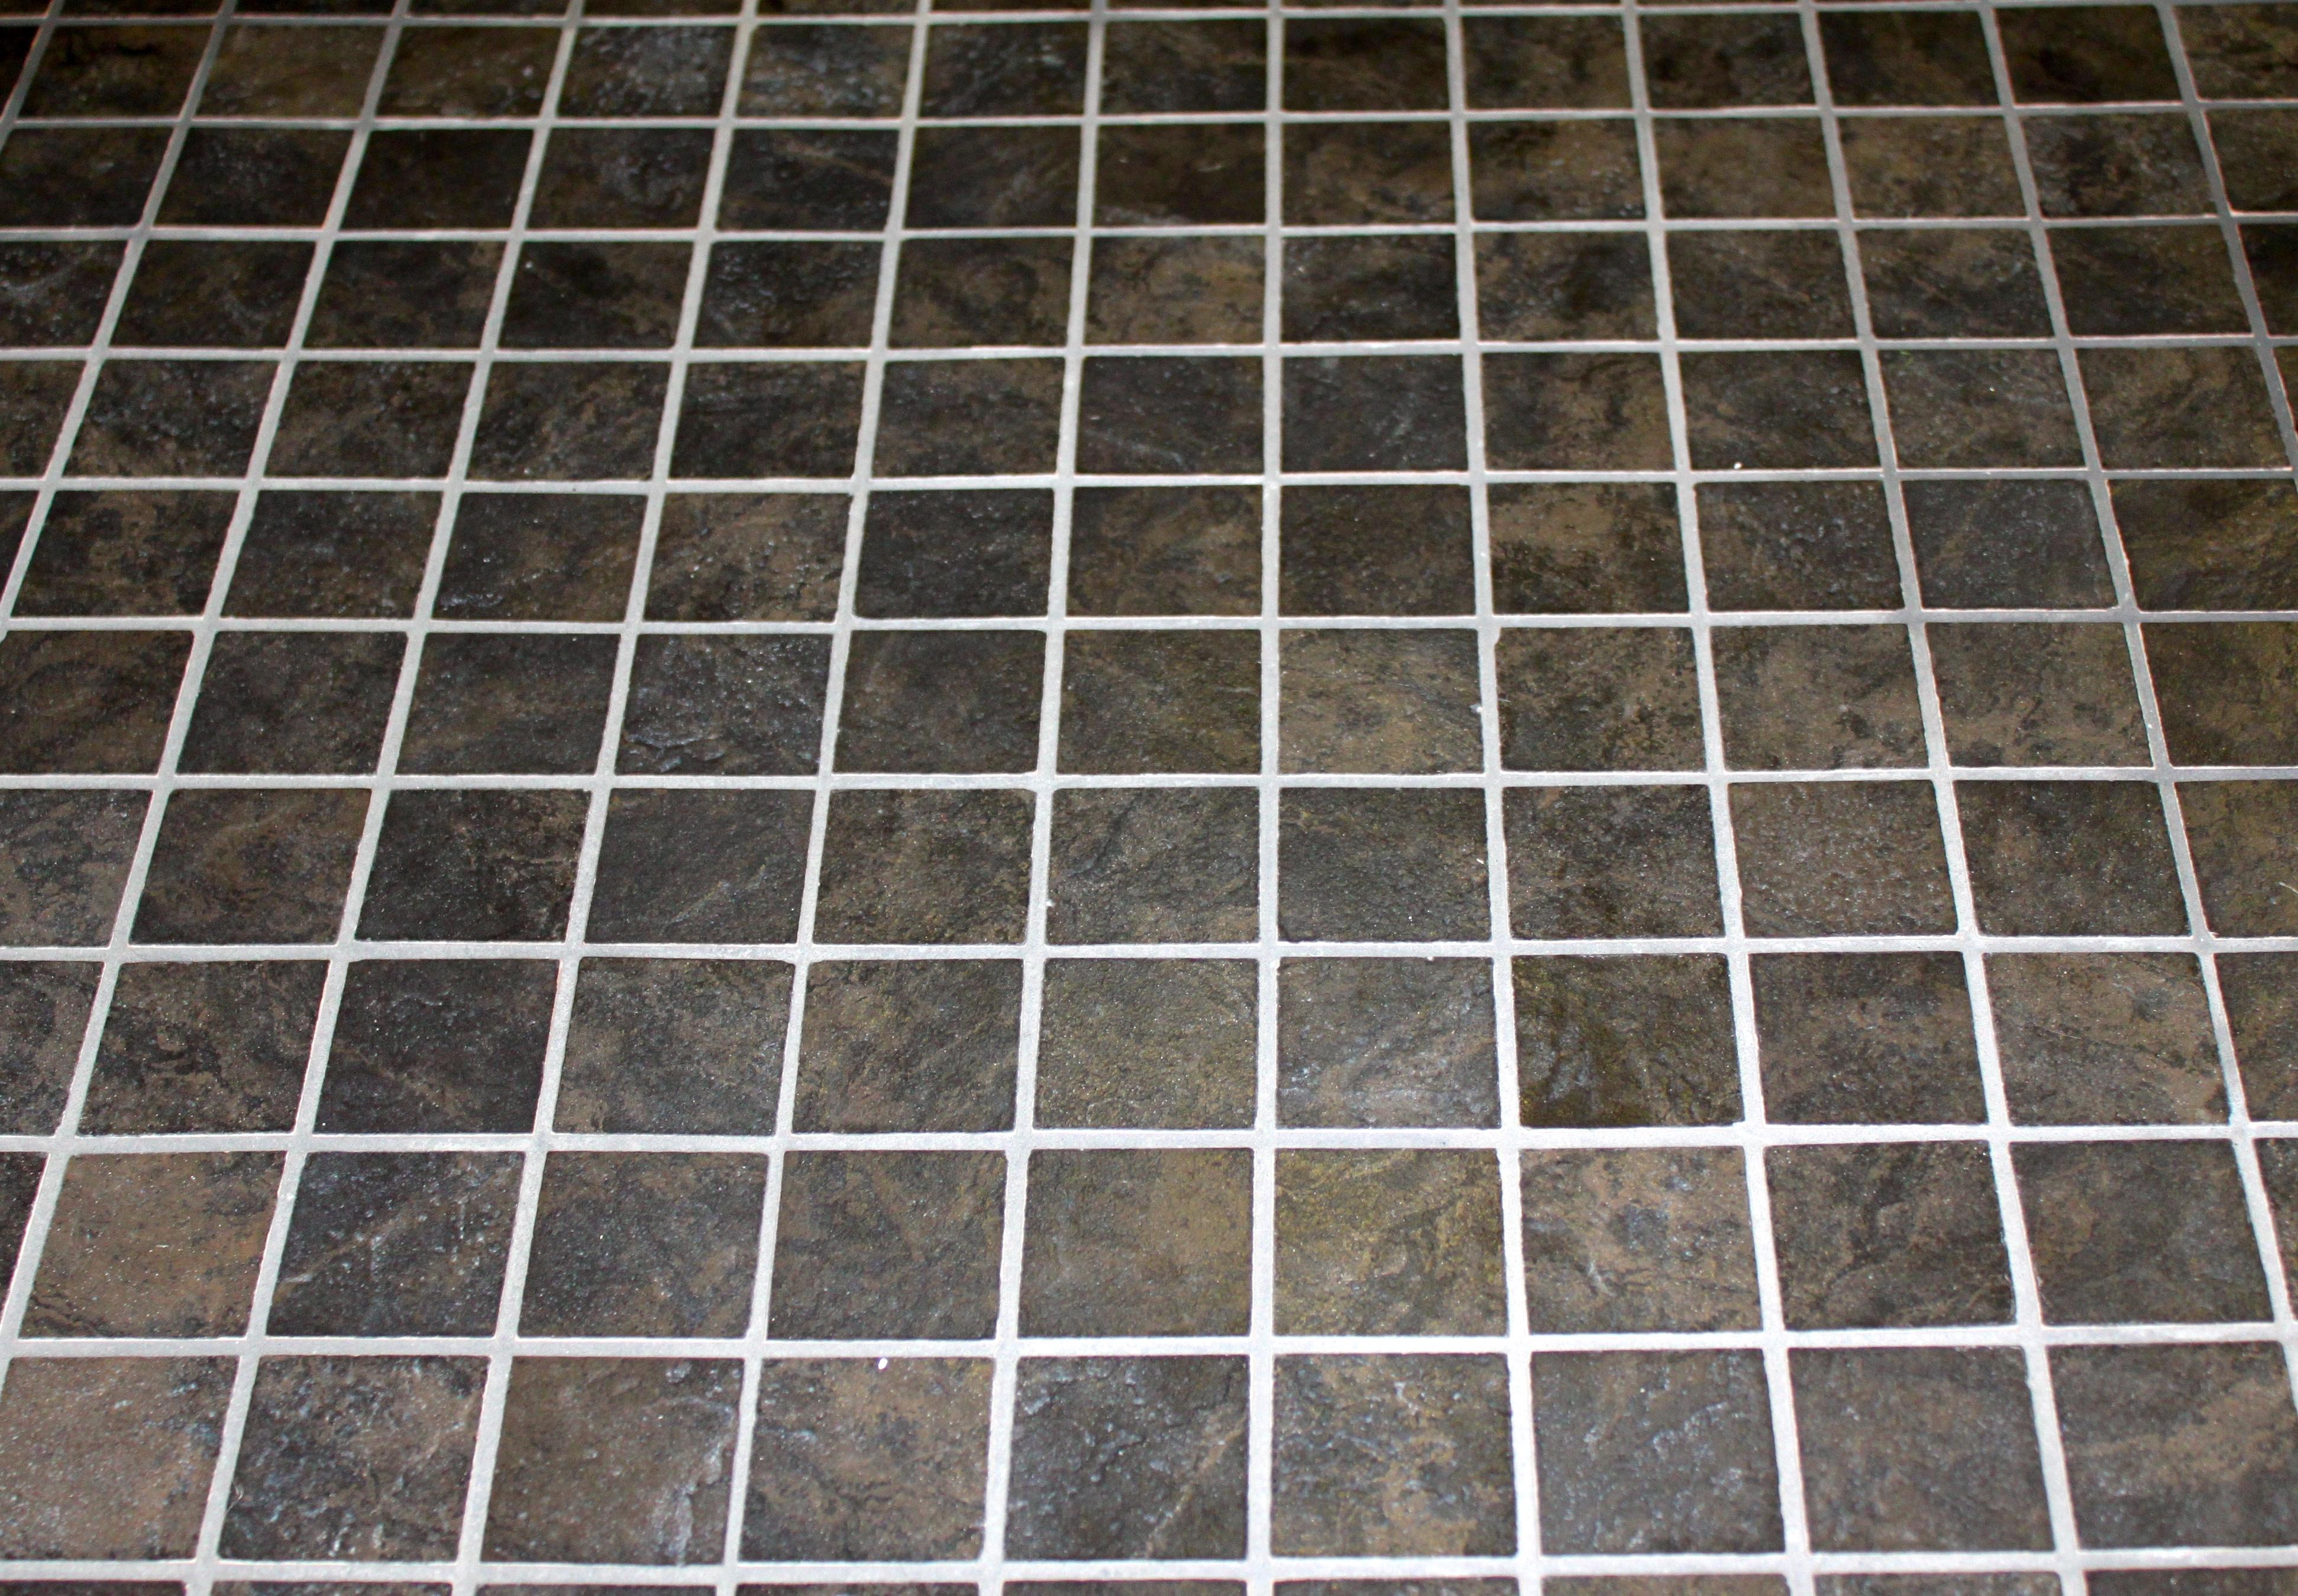 Philadelphia Flyers Carpet Tiles - Carpet Vidalondon